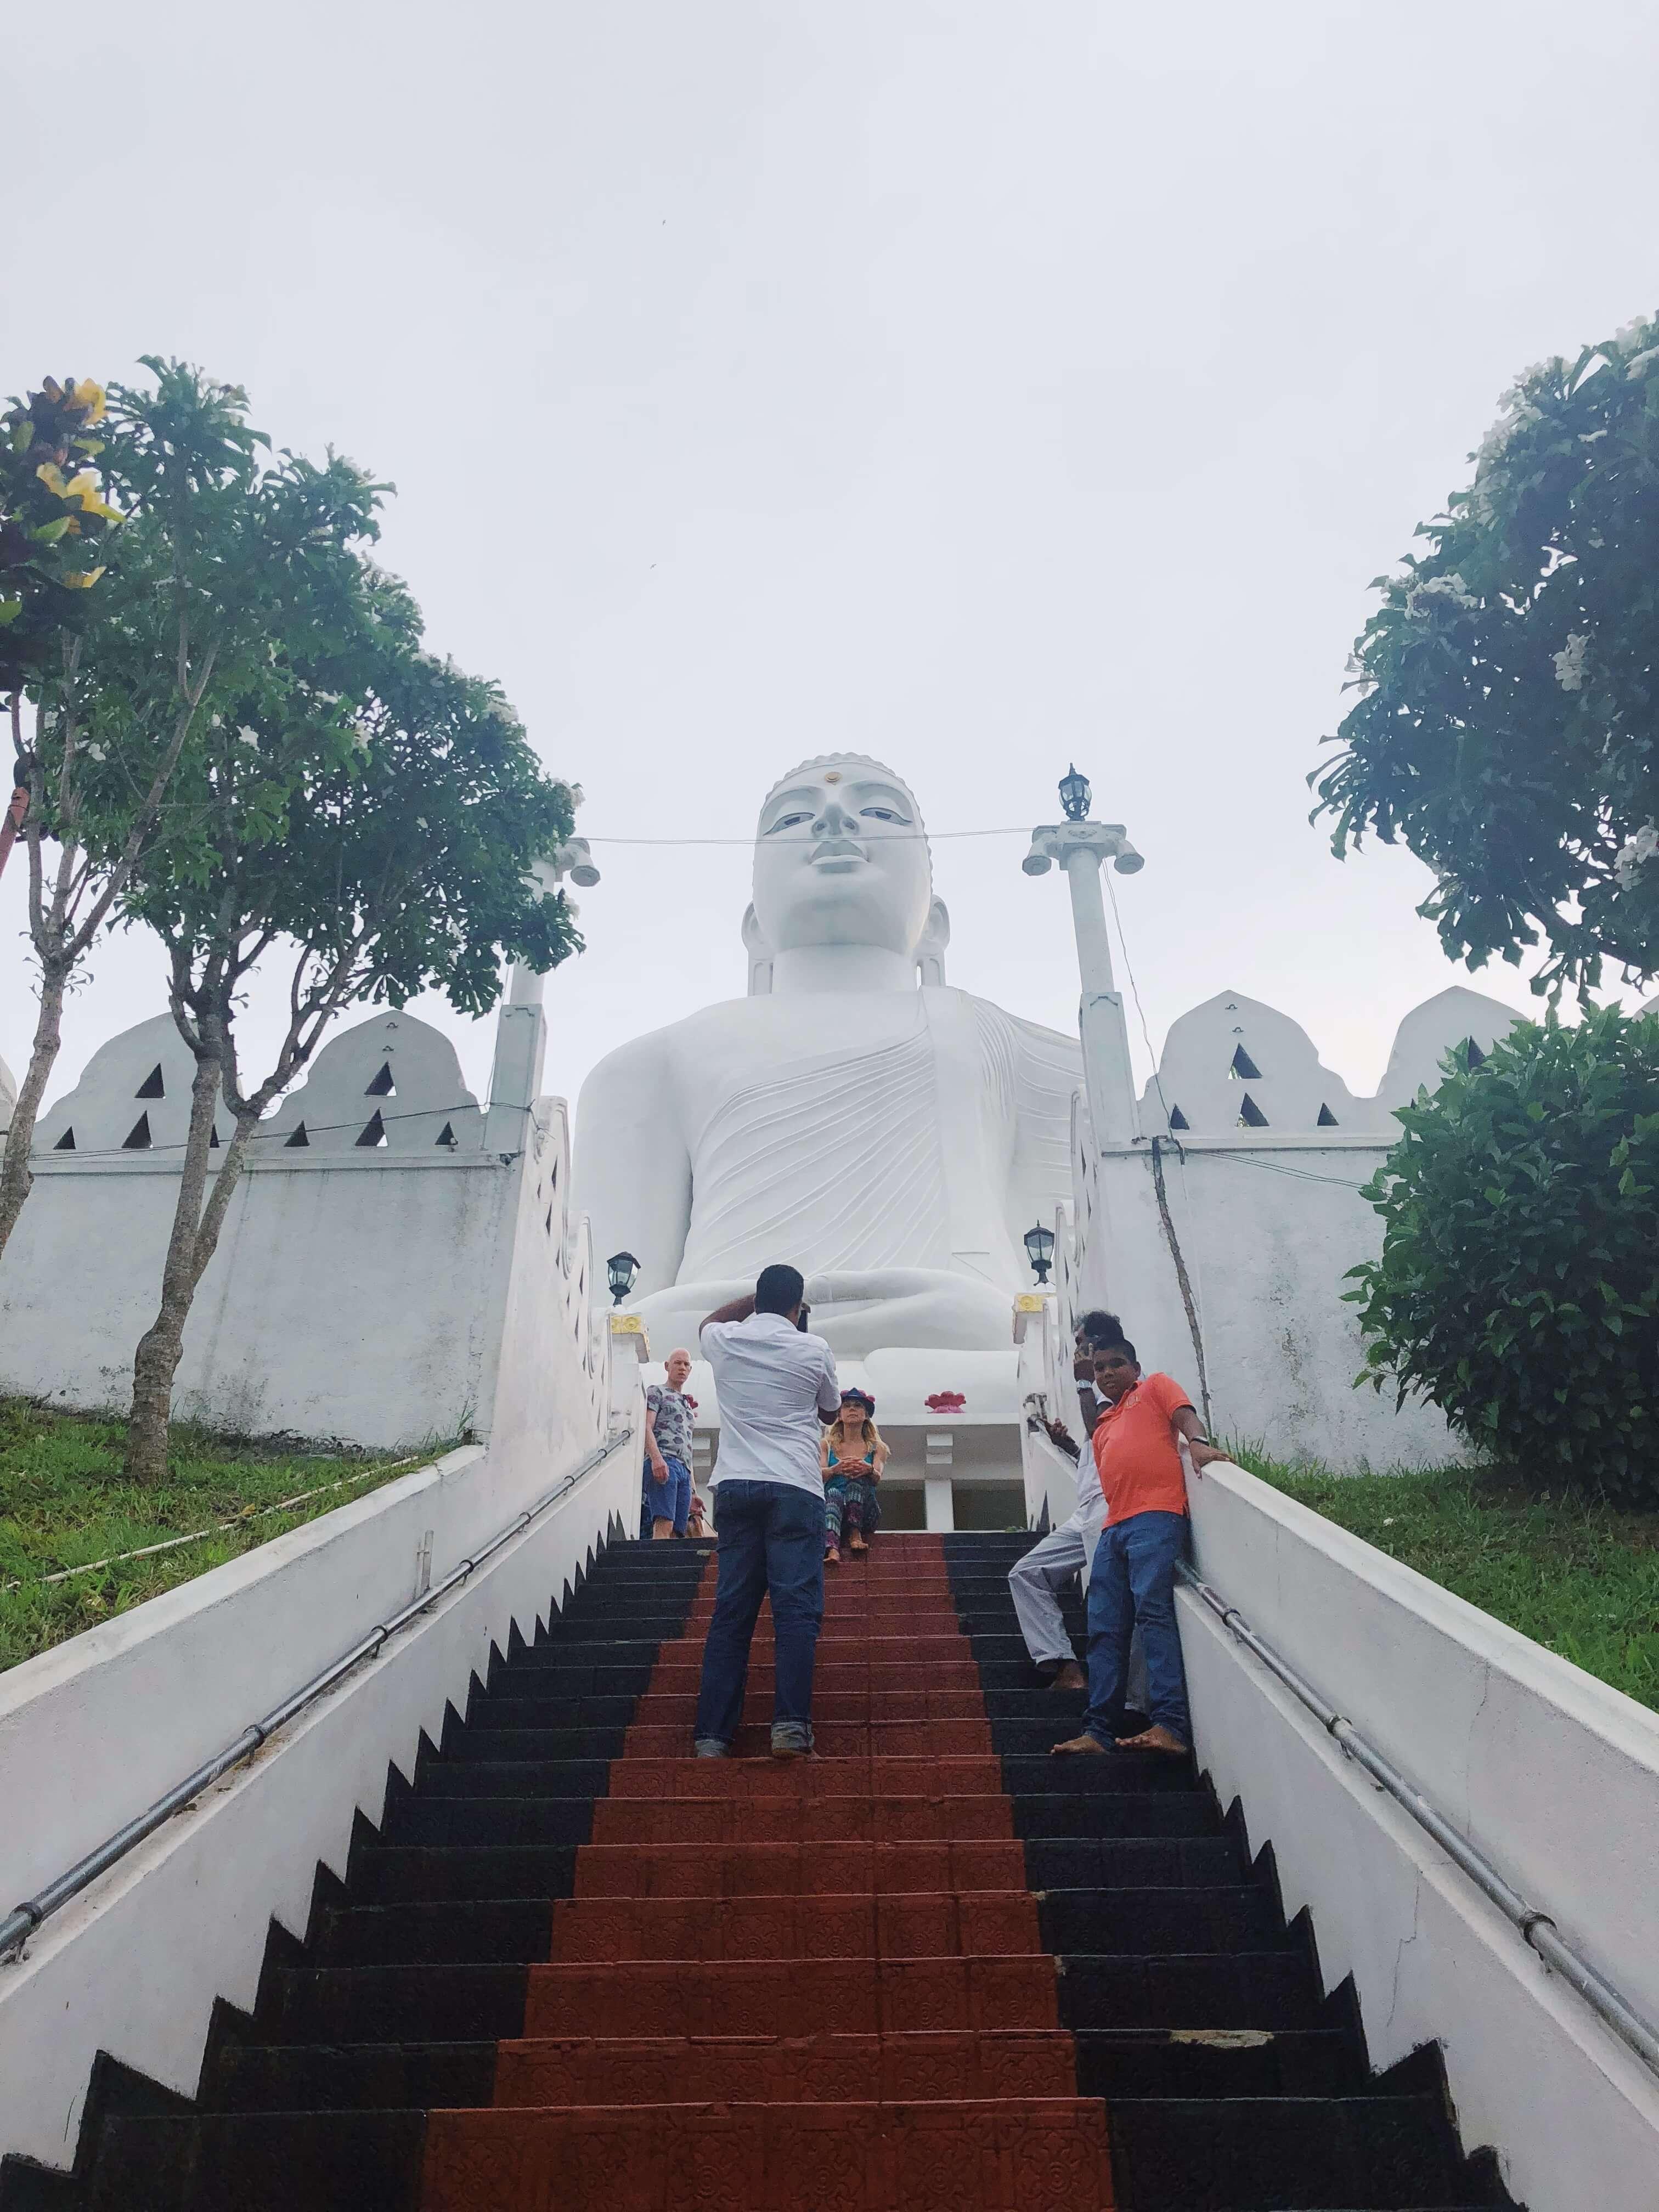 Sri Maha Bodhi Viharaya Buddha in Kandy, Sri Lanka - Village of Bahirawakanda